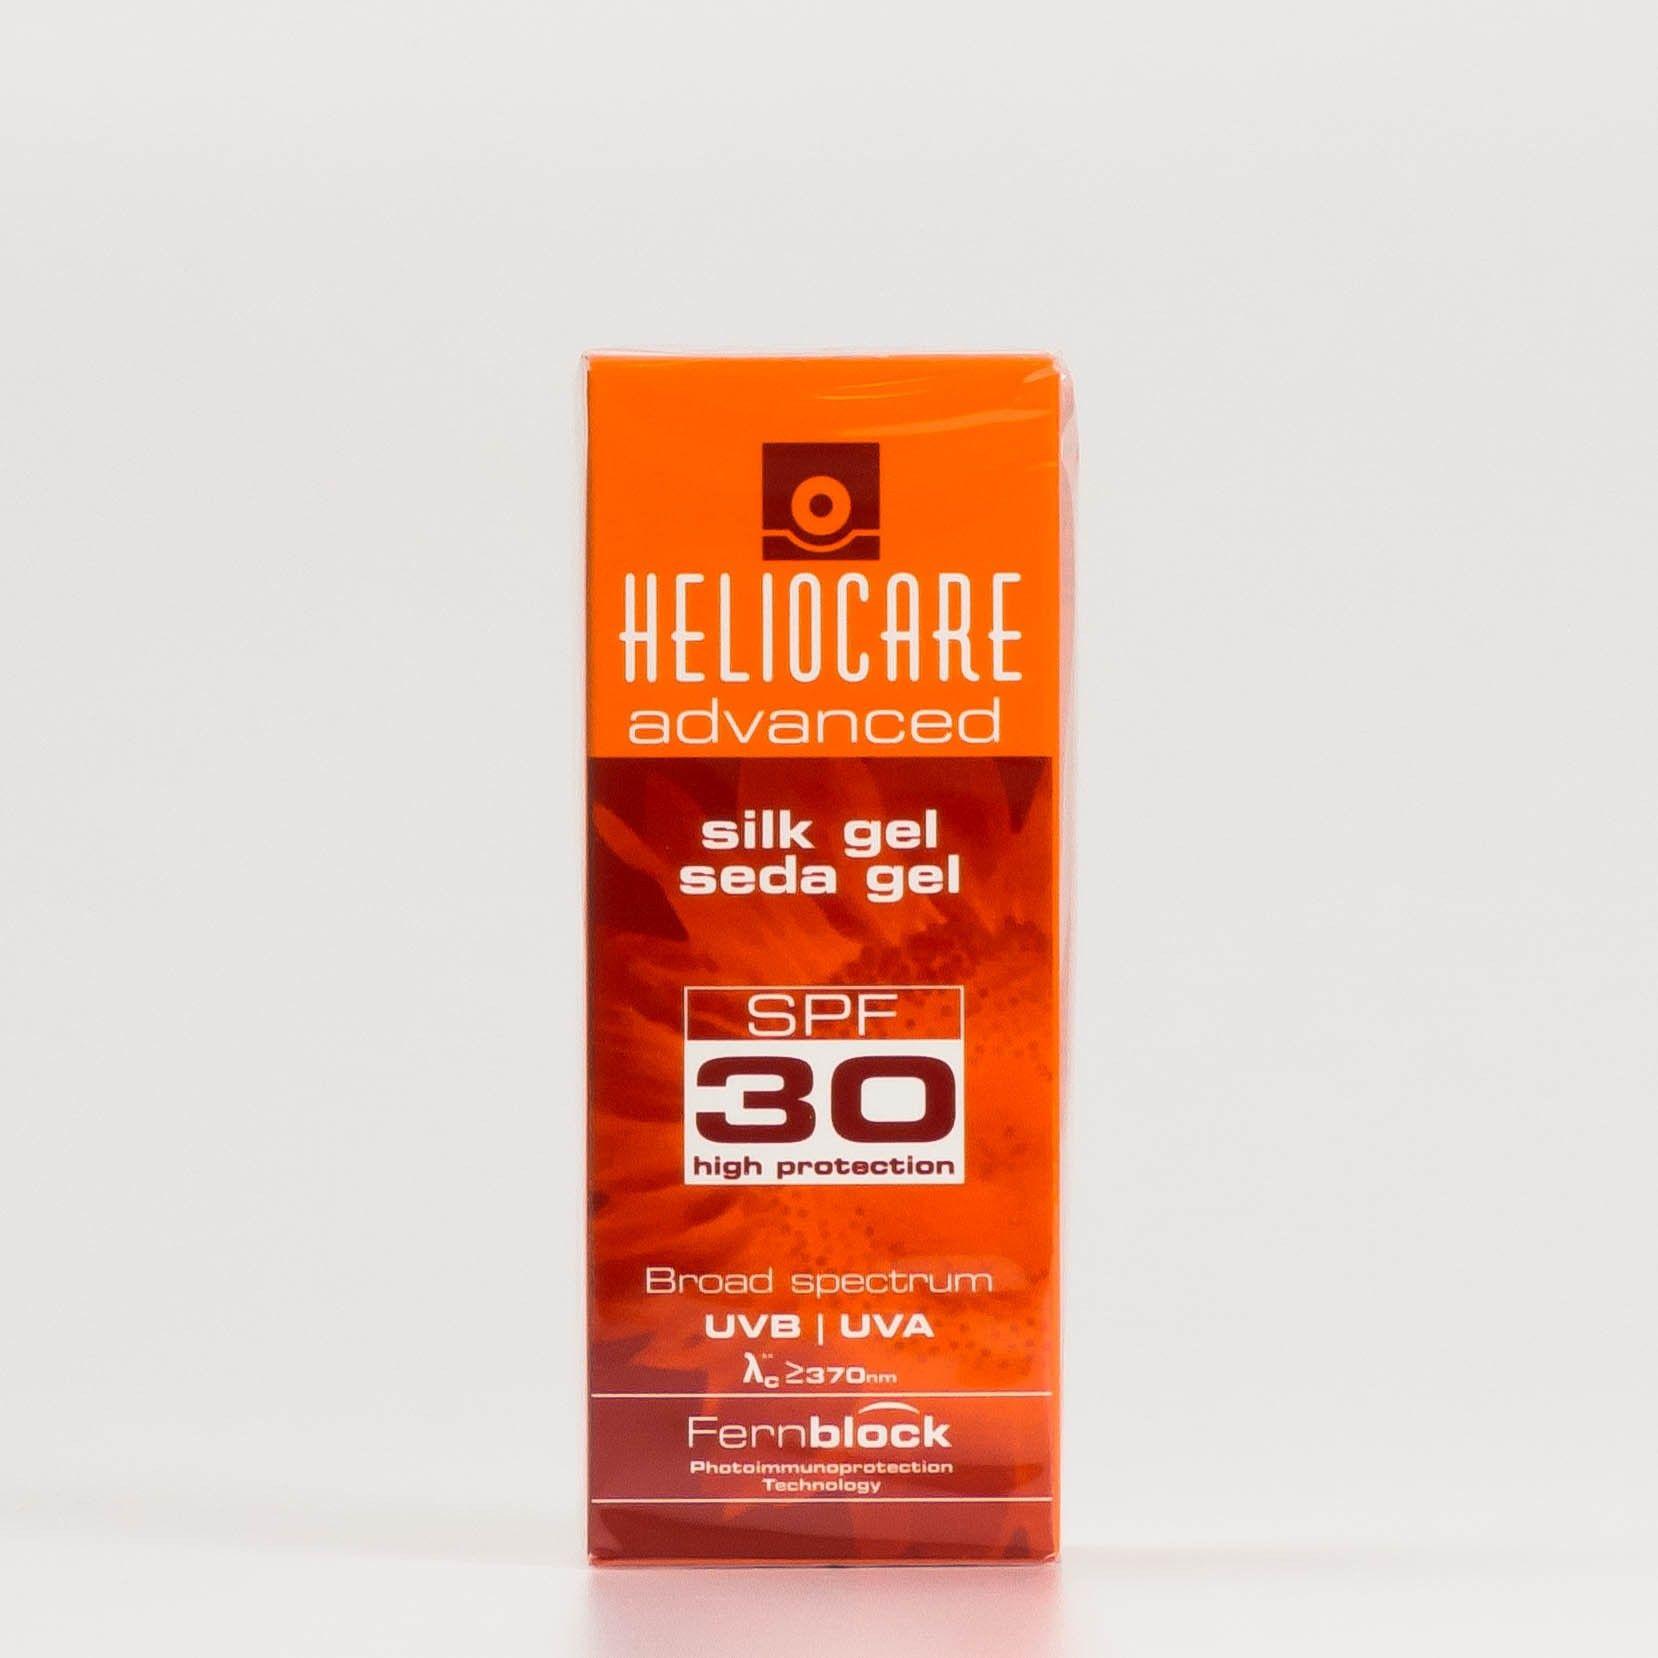 Heliocare Advanced Seda Gel SPF30, 50ml